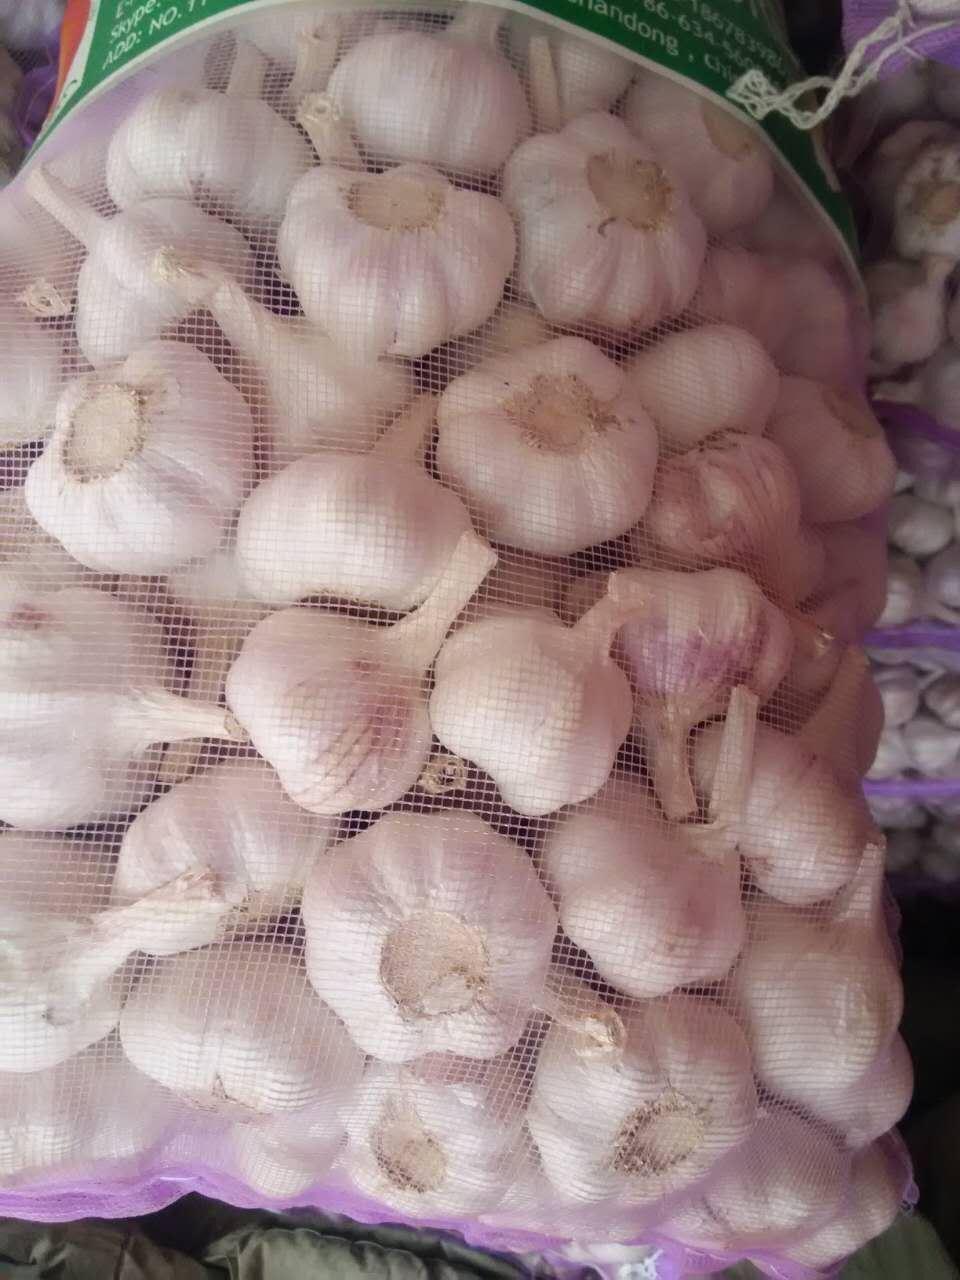 New Crop Fresh Garlic (5.0)